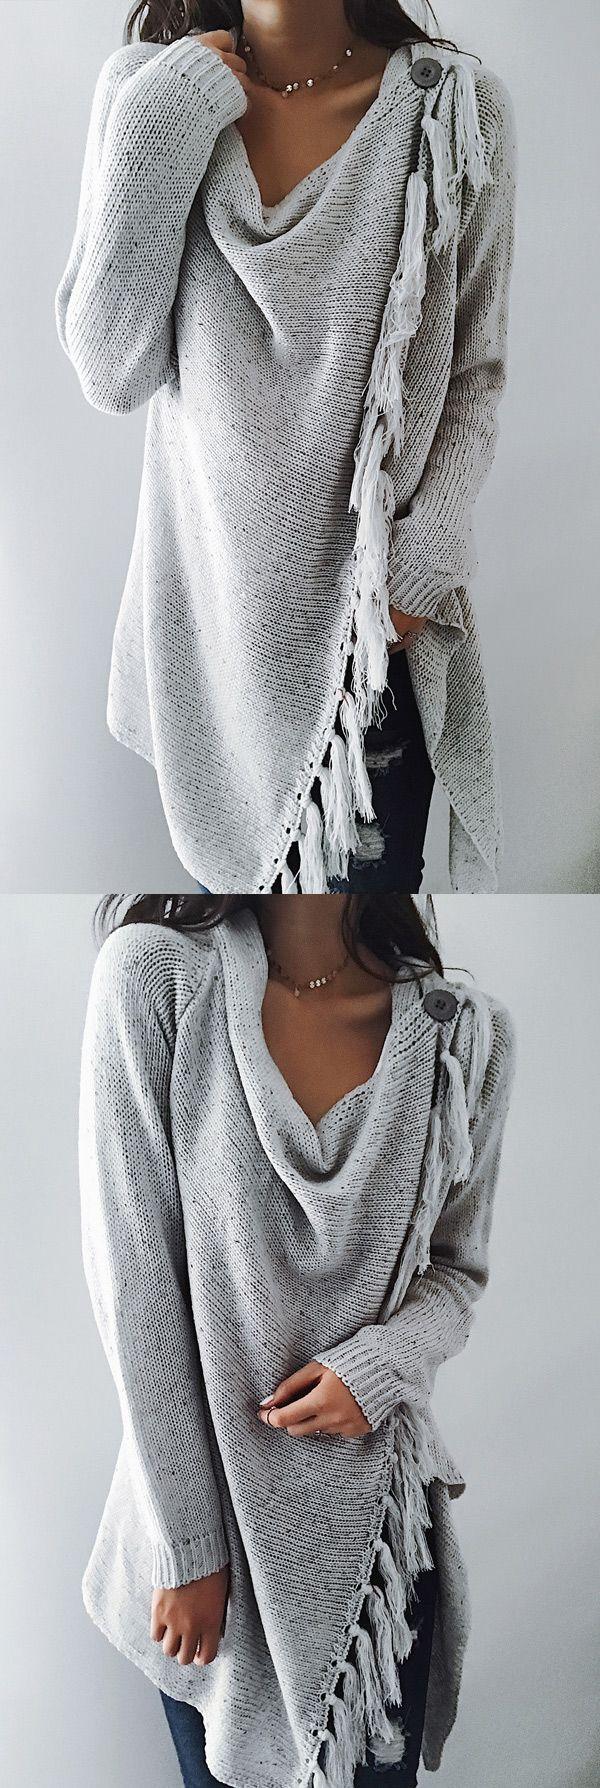 $47.99! Chicnico 2017 Grey Tassel Asymmetrical Hem Shawl Speckled Fringe Cardigan ready for Fall fashion! Find fashionable outfits for the new